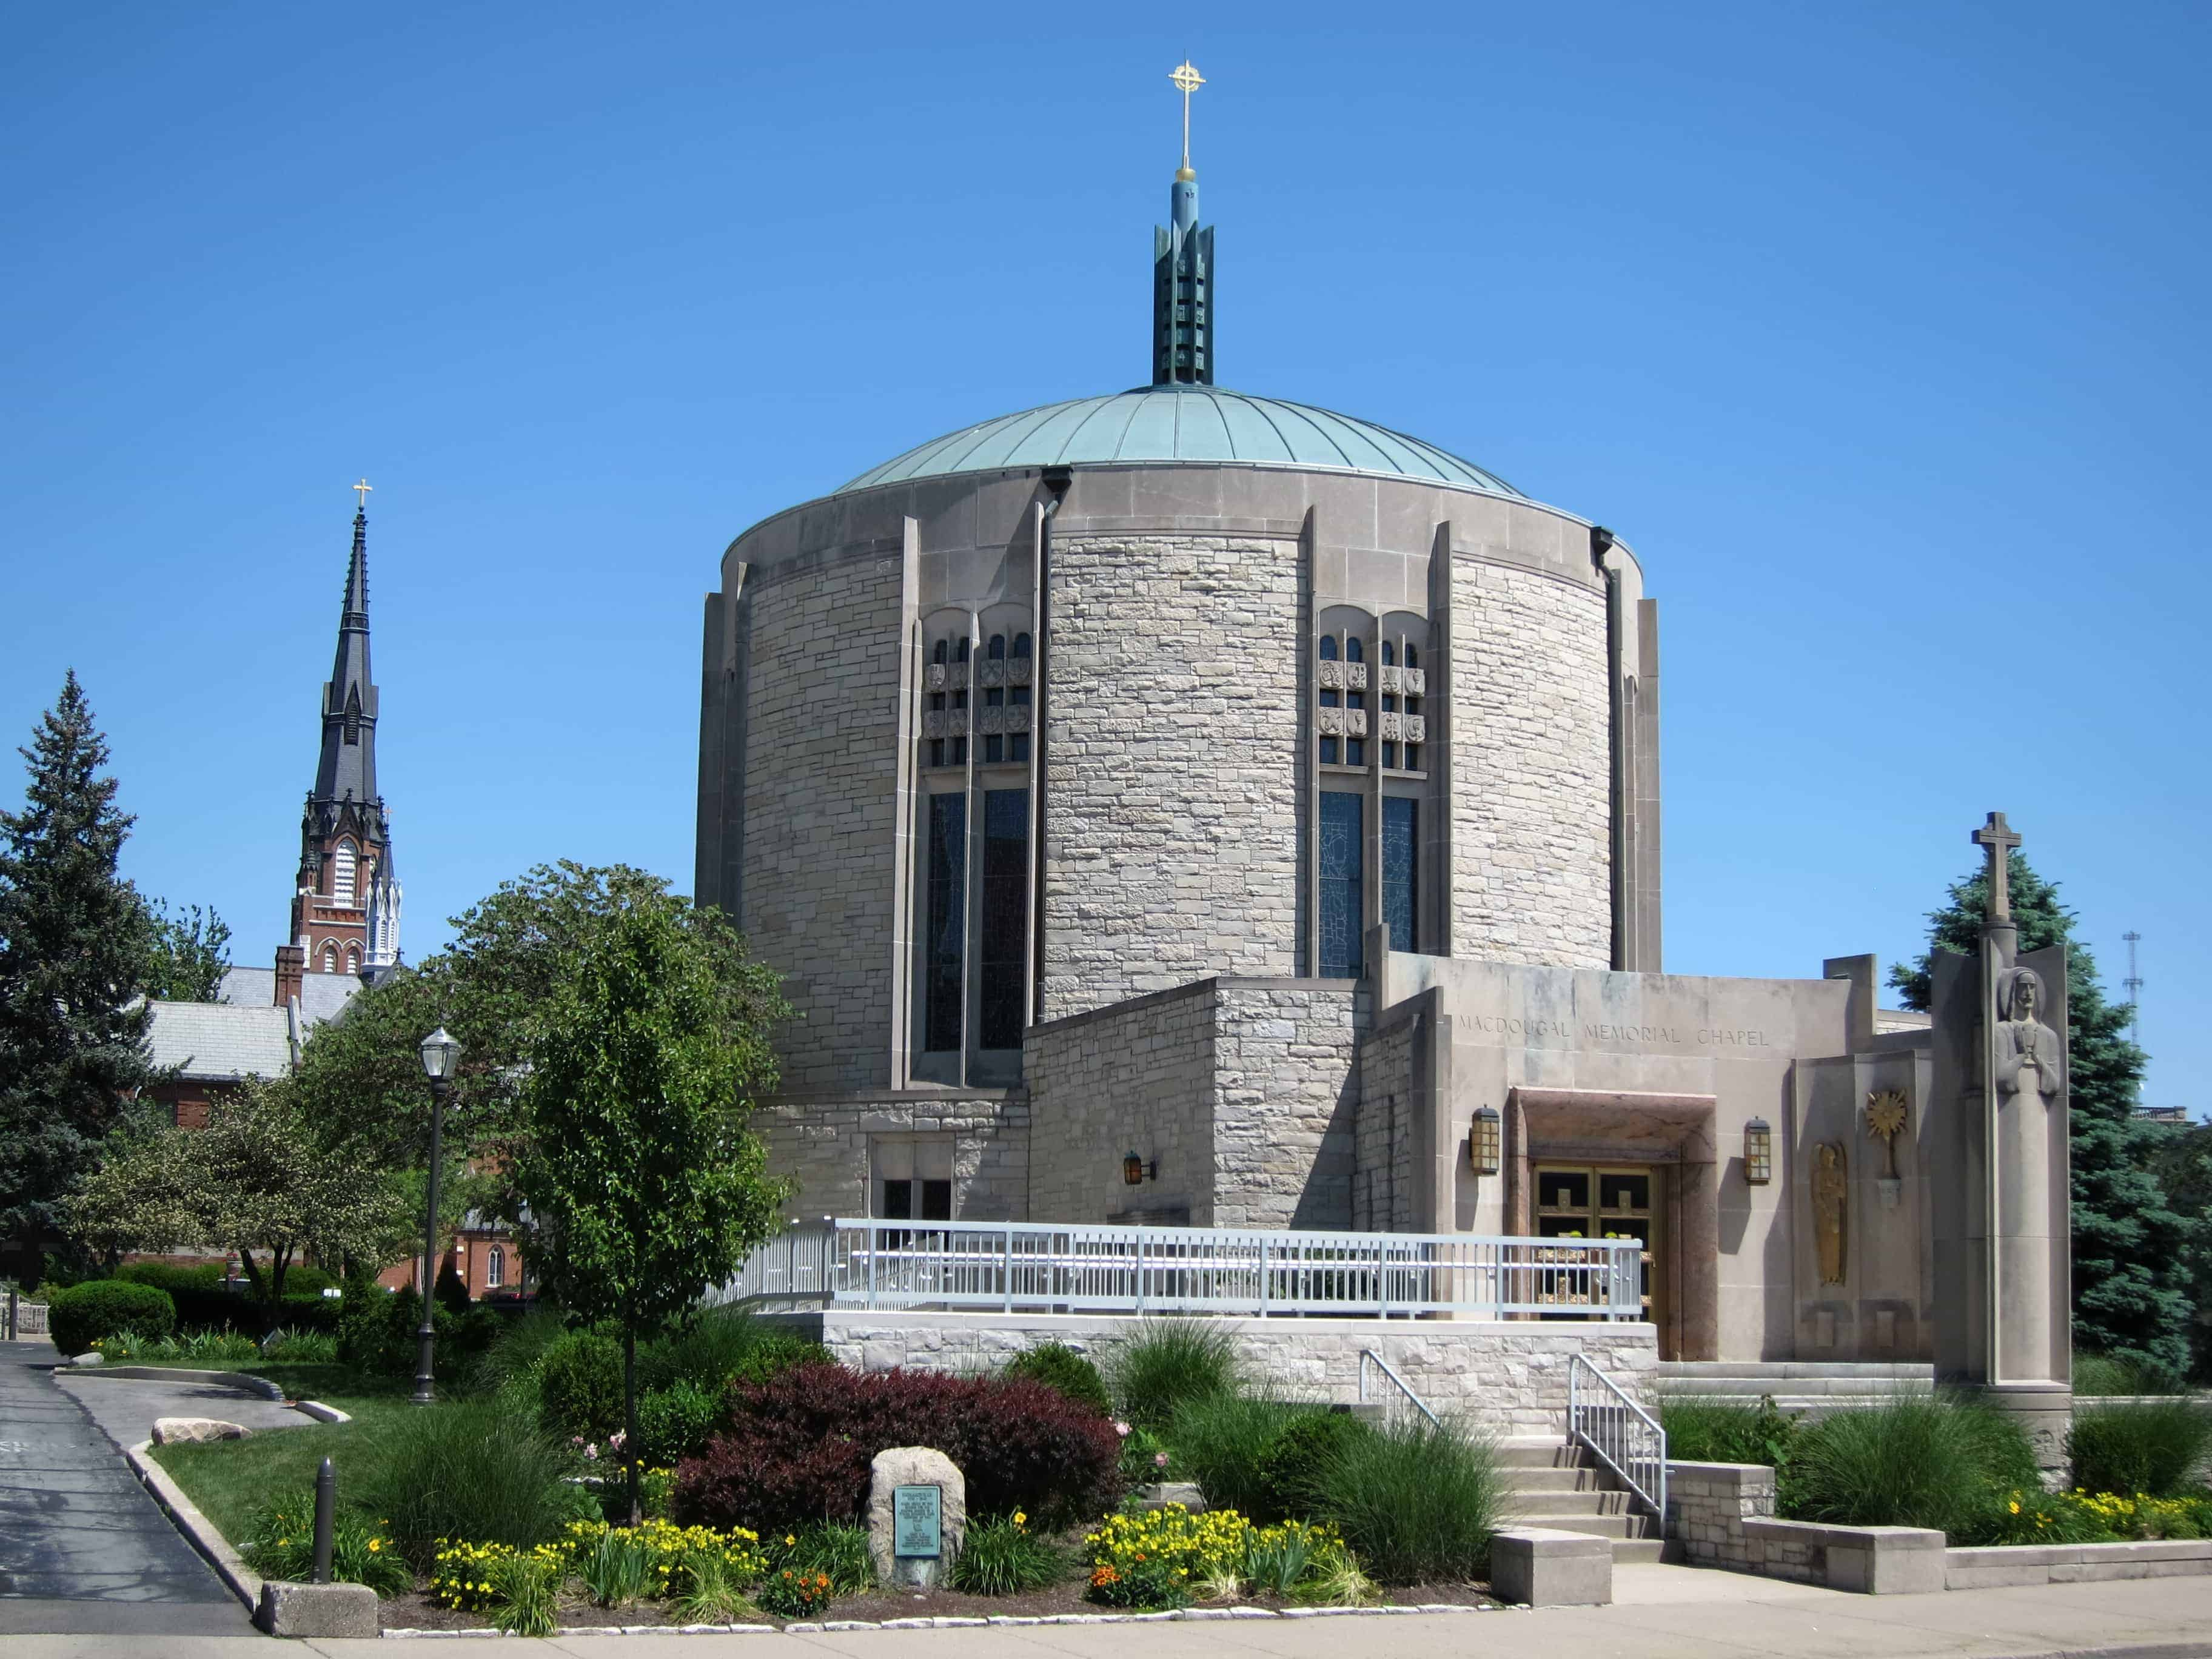 Saint Mother Theodore Guerin Chapel Fort Wayne, Indiana